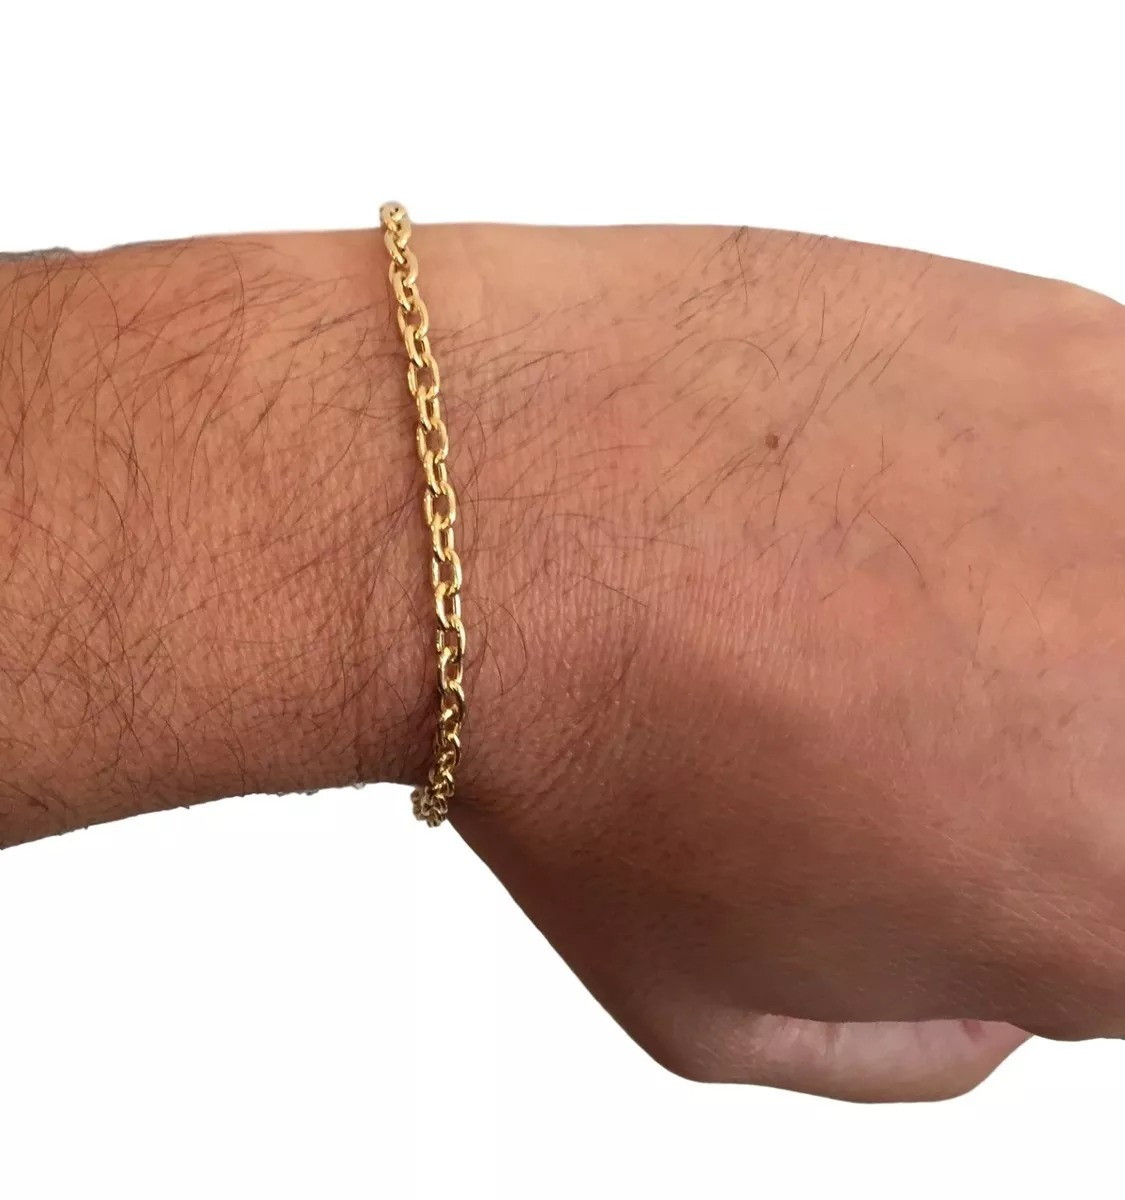 562e43c9668 Pulseira cartier cadeado moeda antiga cor de ouro 3mm no Elo7 ...